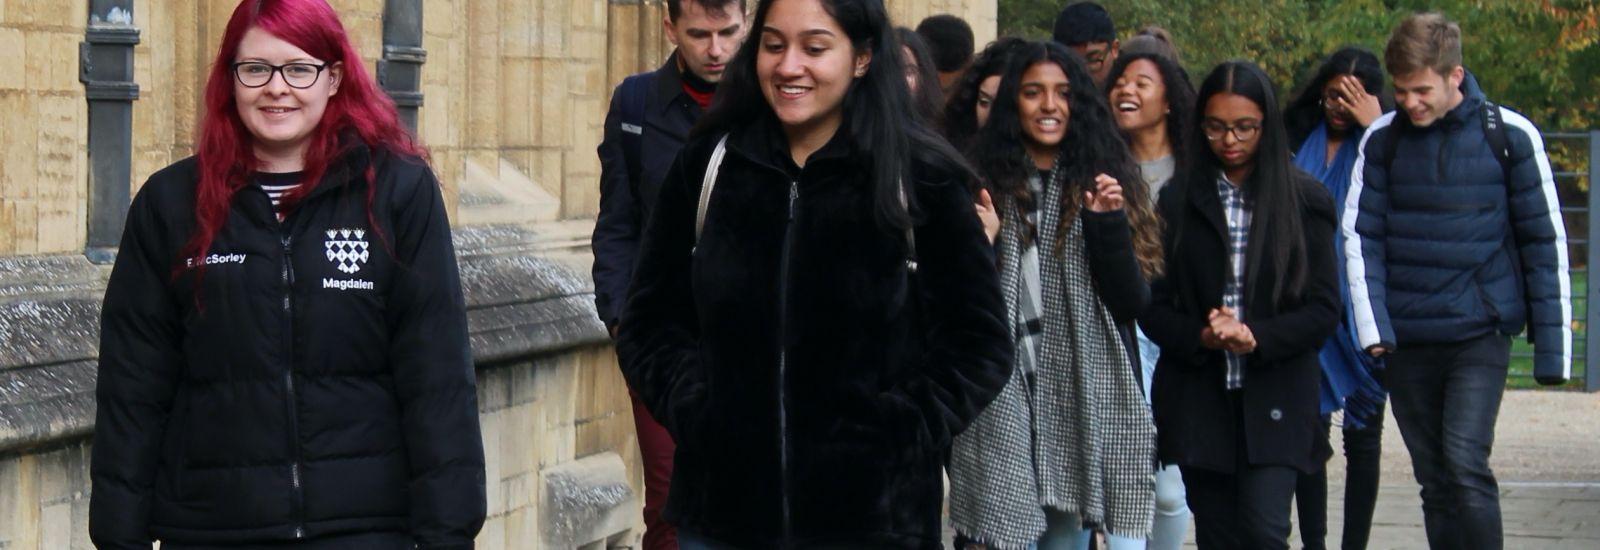 Magdalen student ambassador, Ellie, meeting a group of prospective applicants.